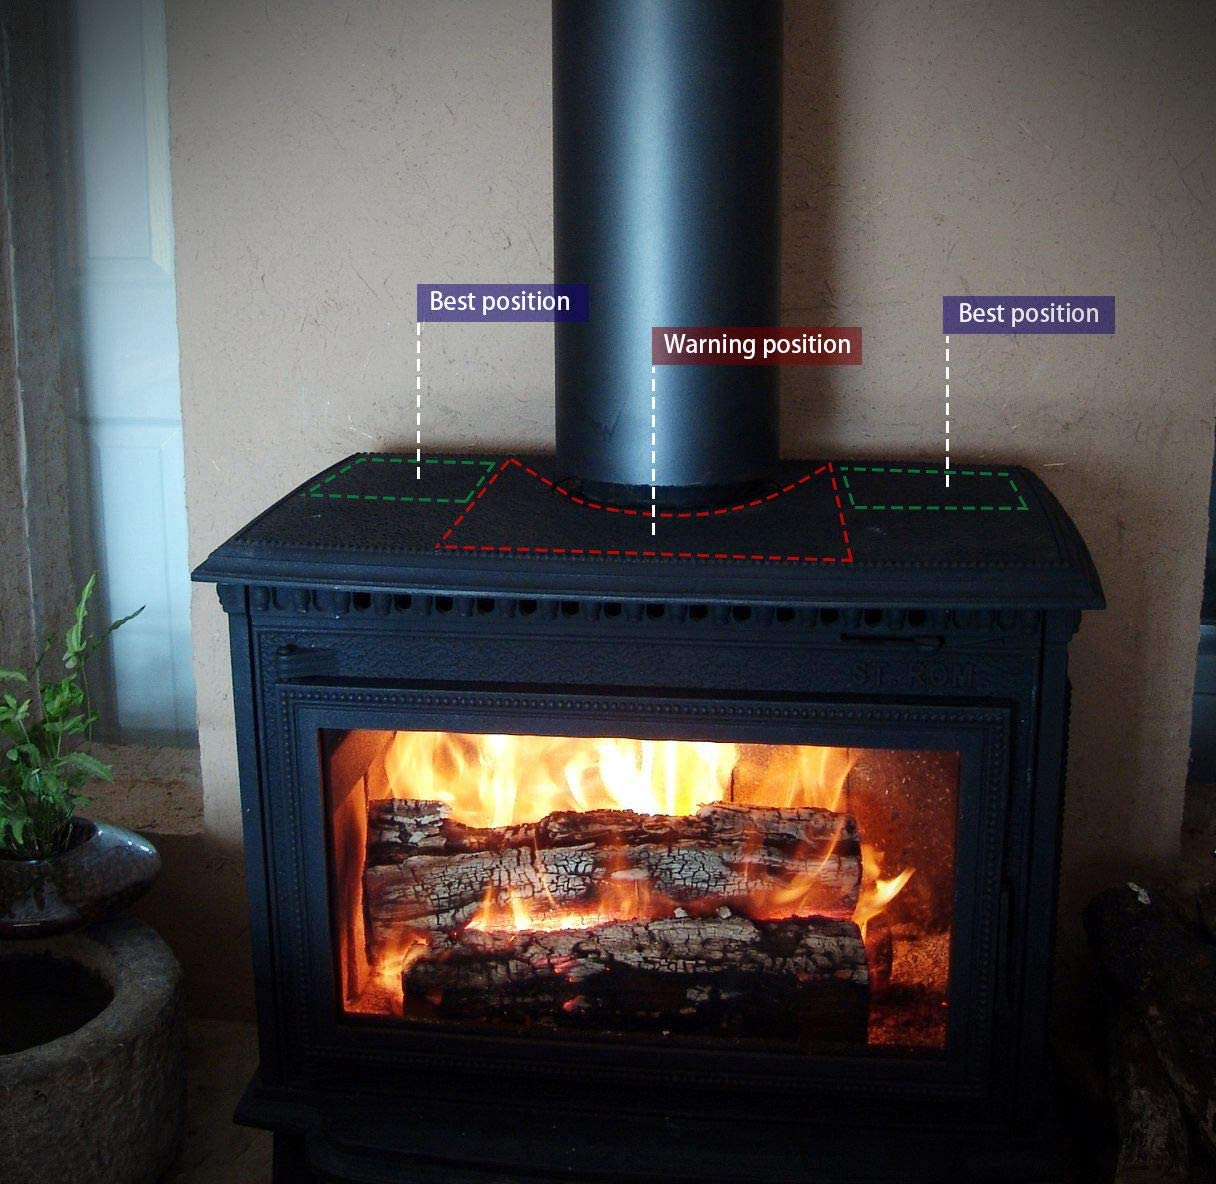 Ventilador de chimenea, XBCC estufa de leña ventilador de chimenea ...